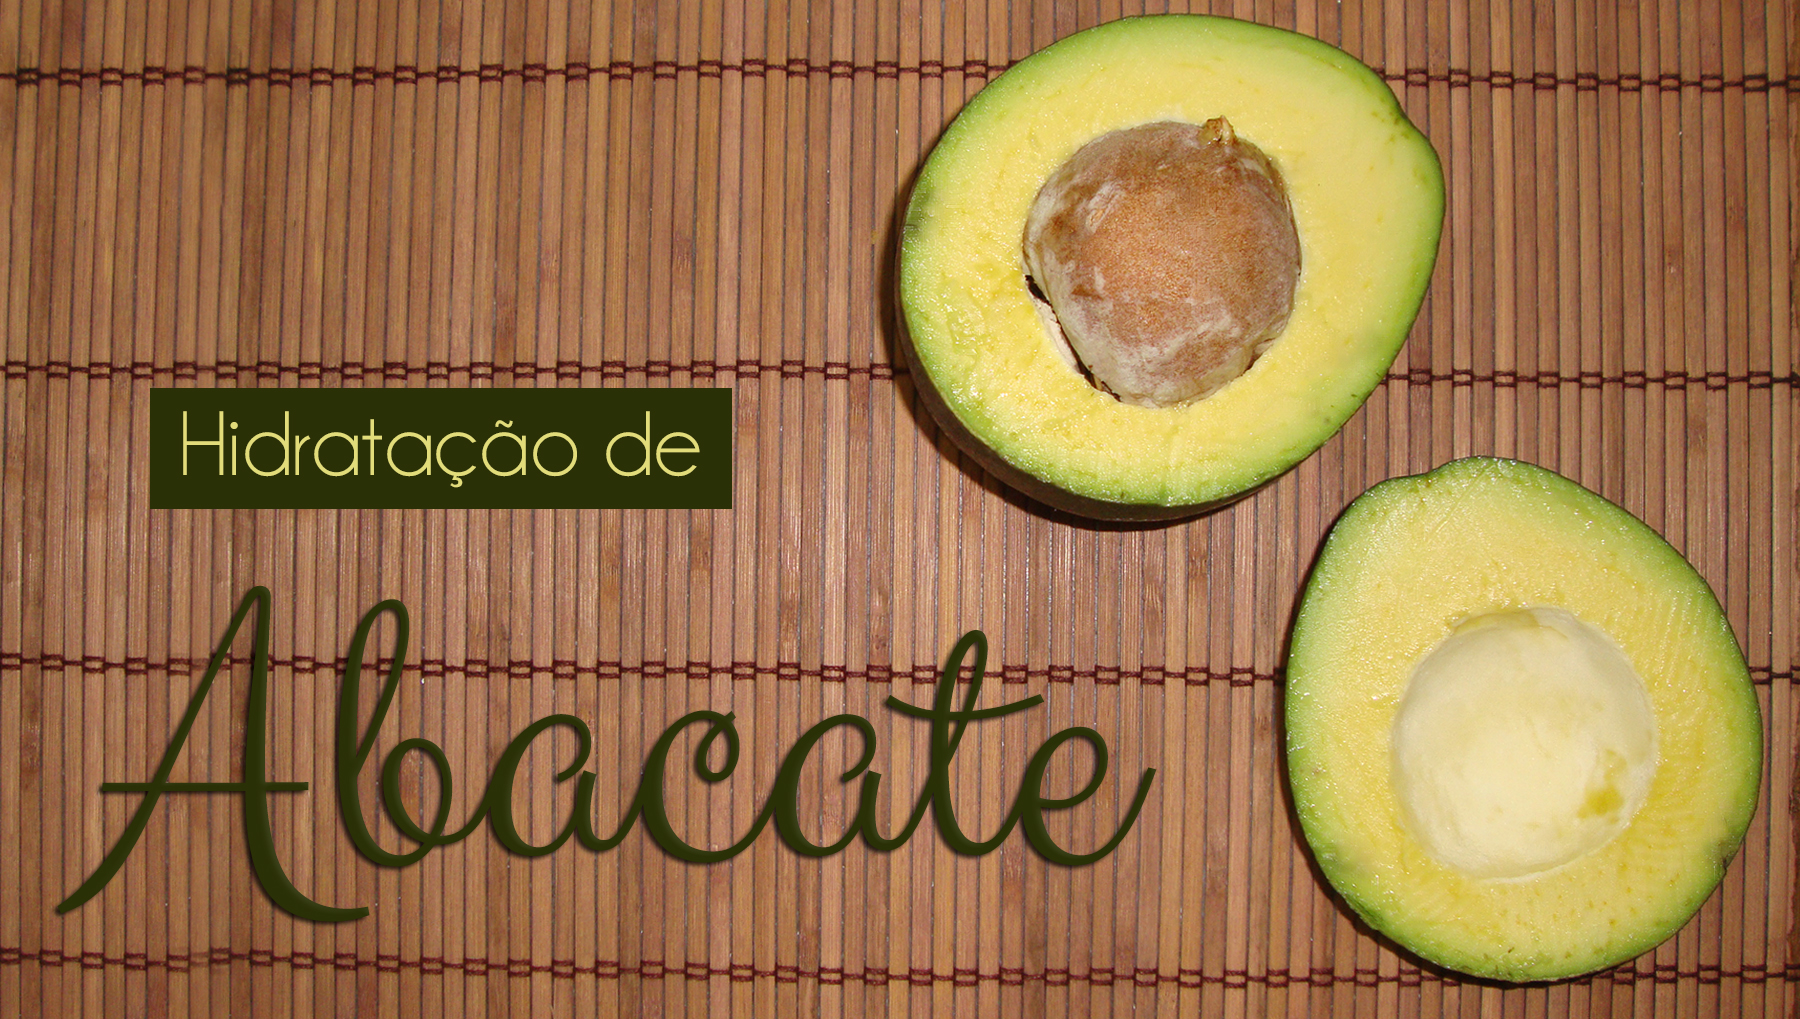 hidratacao-cabelo-facil-abacate